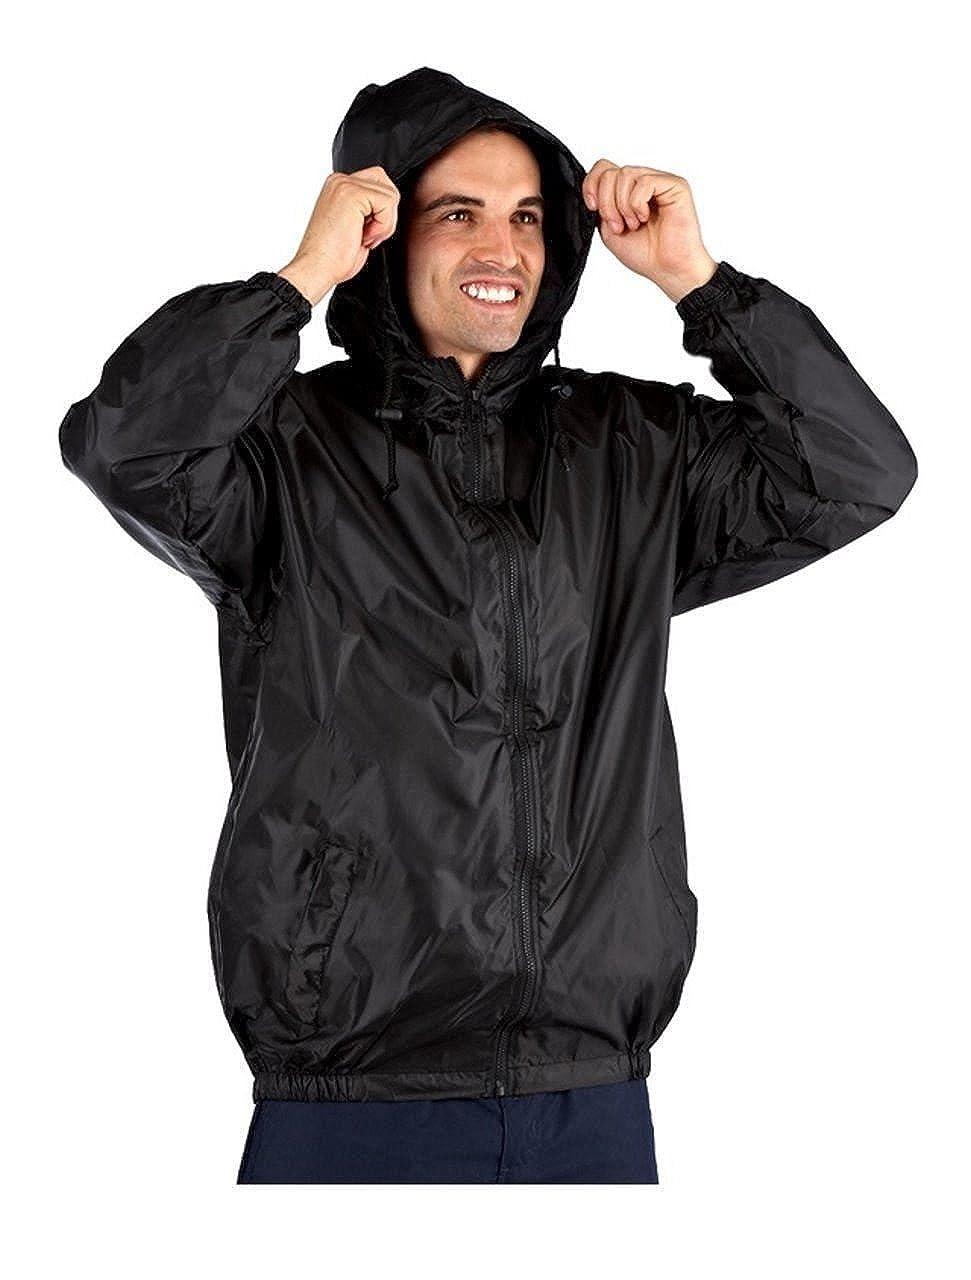 Mens ProClimate Kag In A Bag Festival Coat Waterproof Wind Resistant Jacket  Mac  Amazon.co.uk  Clothing e6bec25876